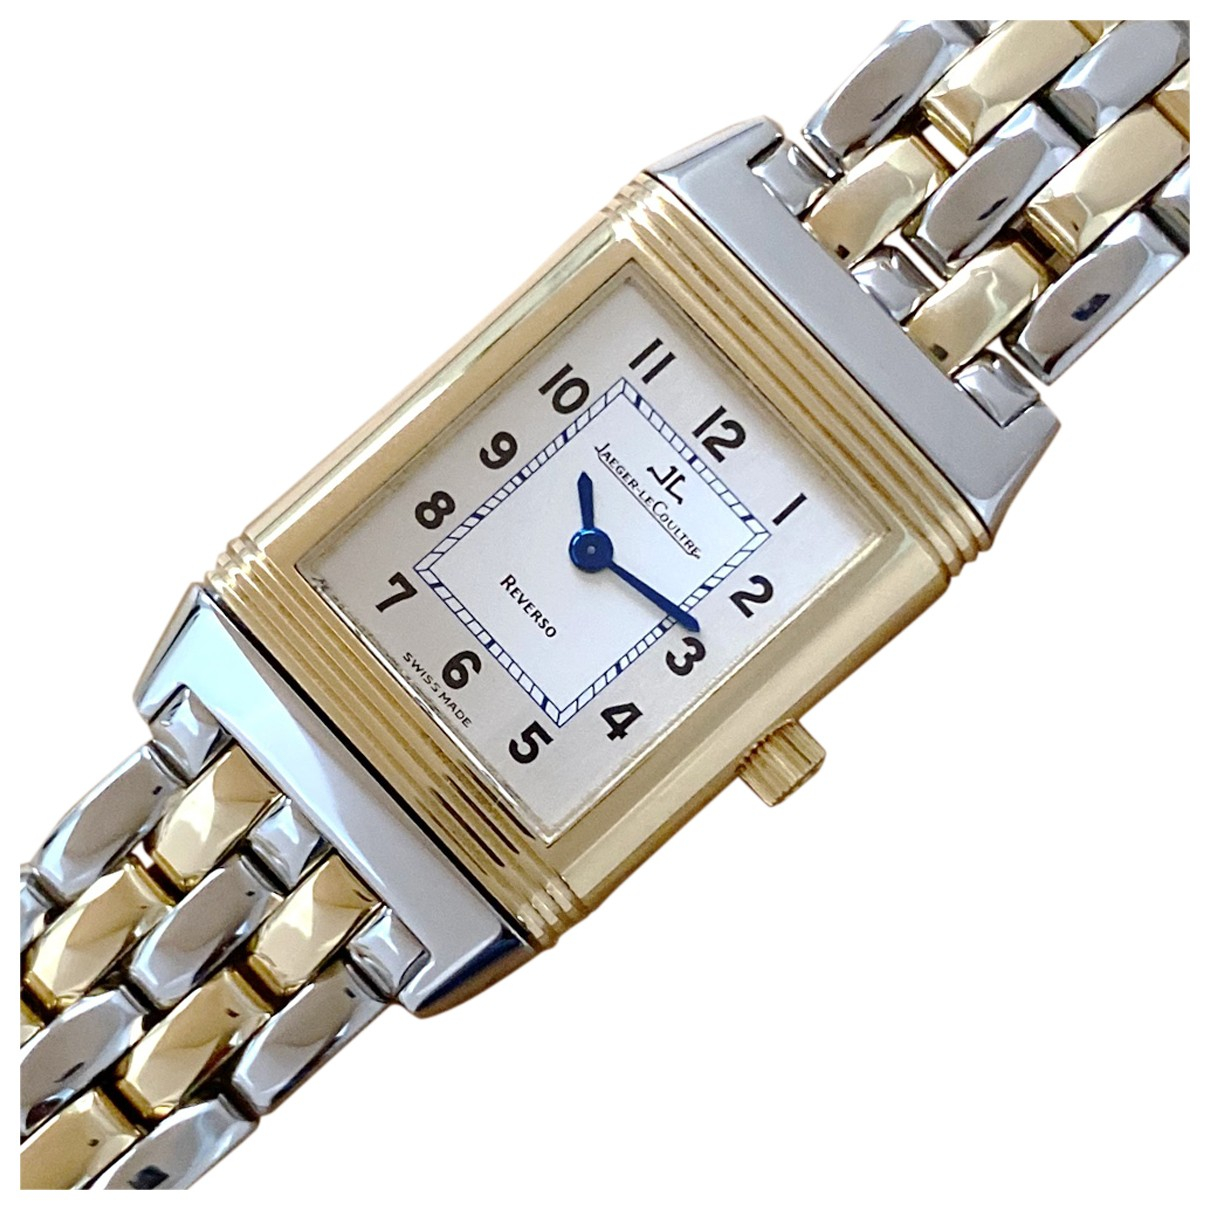 Reloj Reverso Jaeger-lecoultre